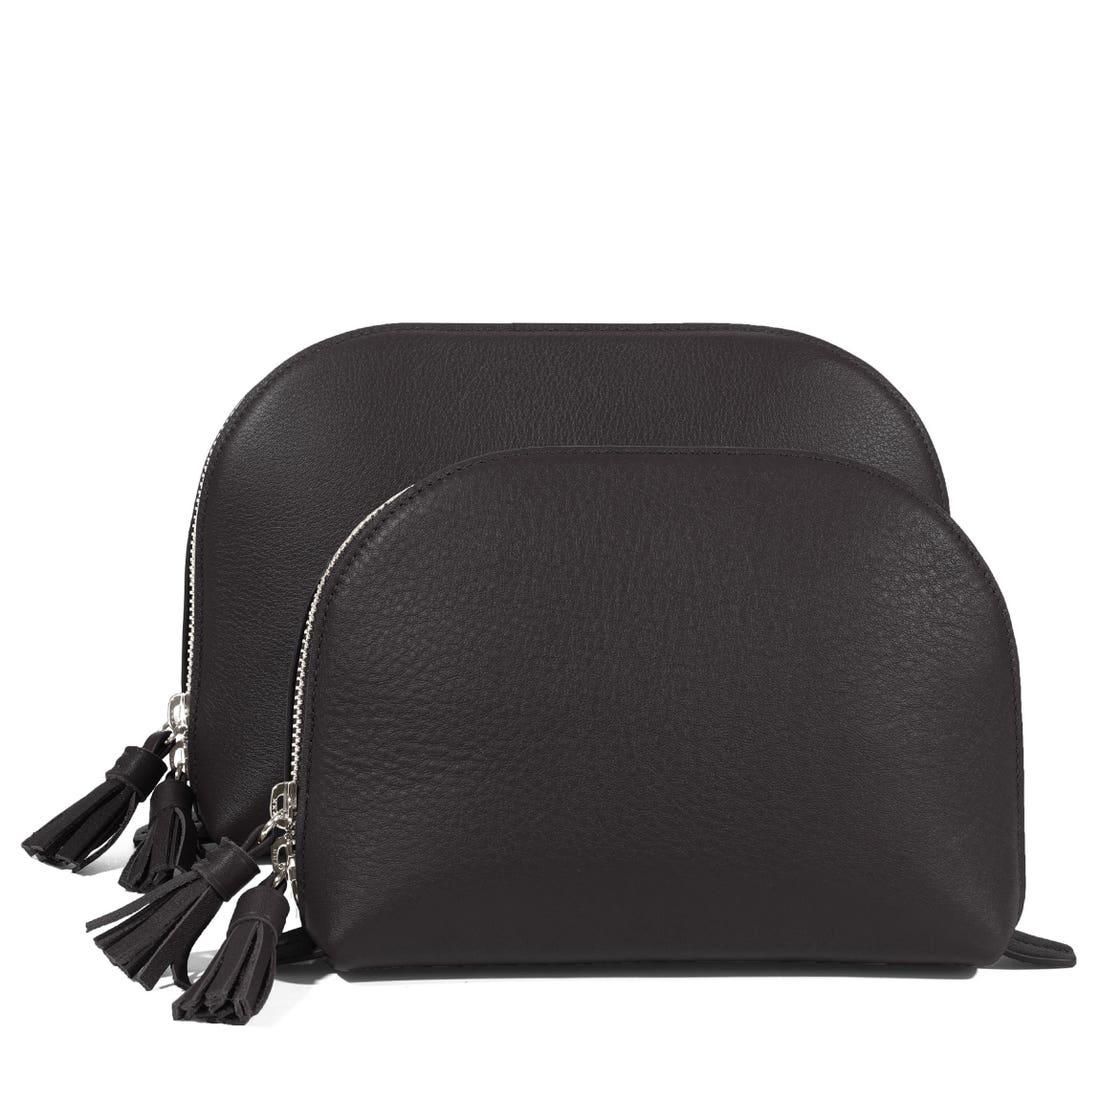 Clamshell Makeup Bag Set